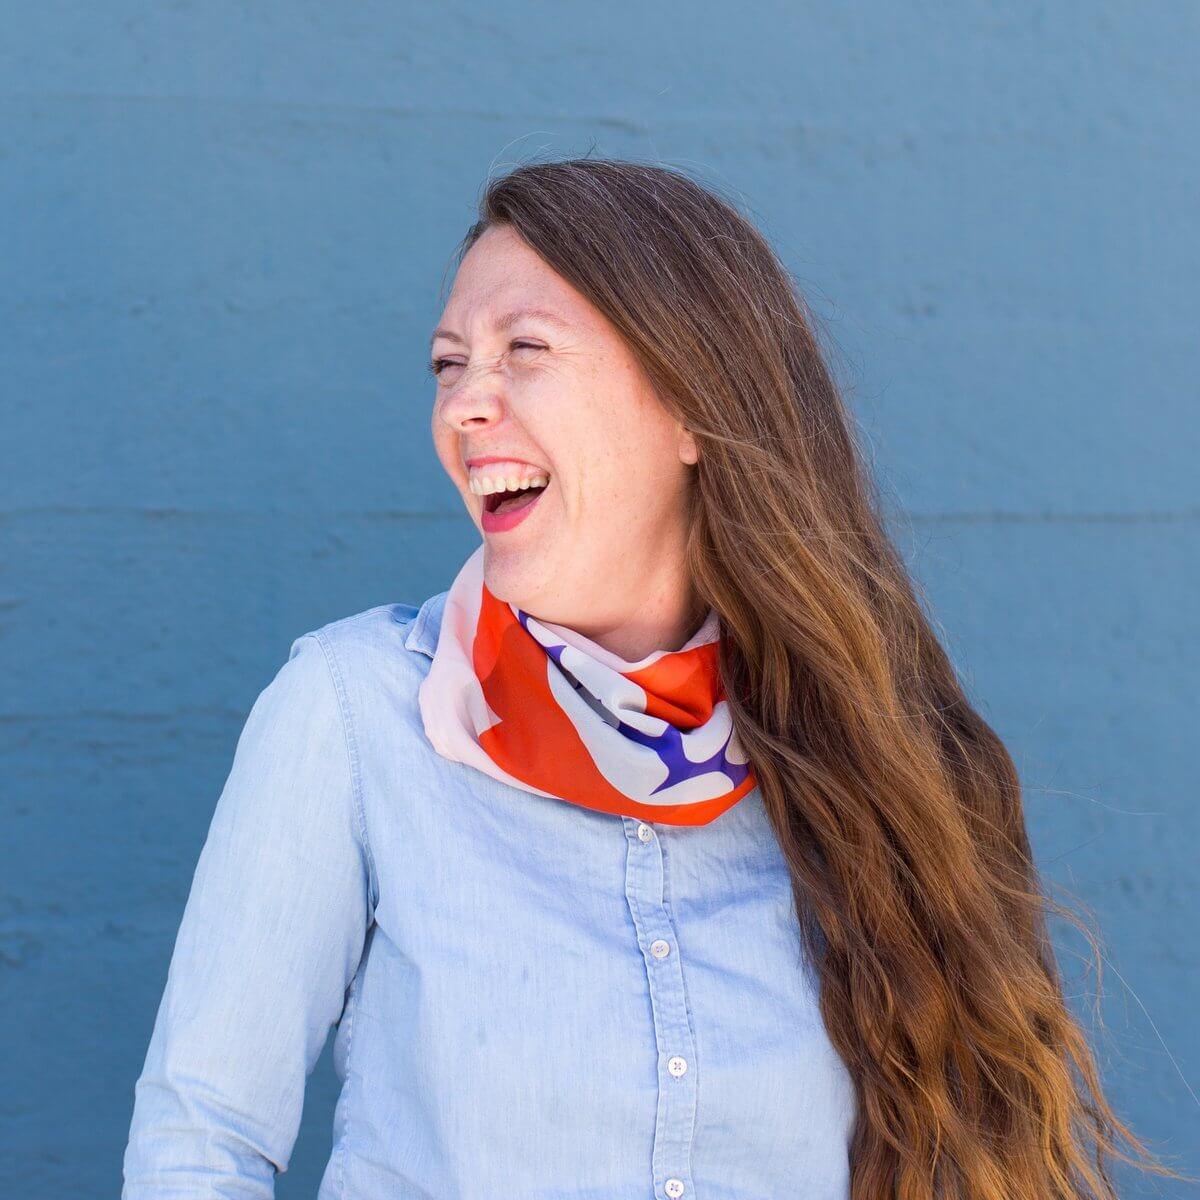 030 Franziska Parschau: Adobe's Creative Residency and Community Programs